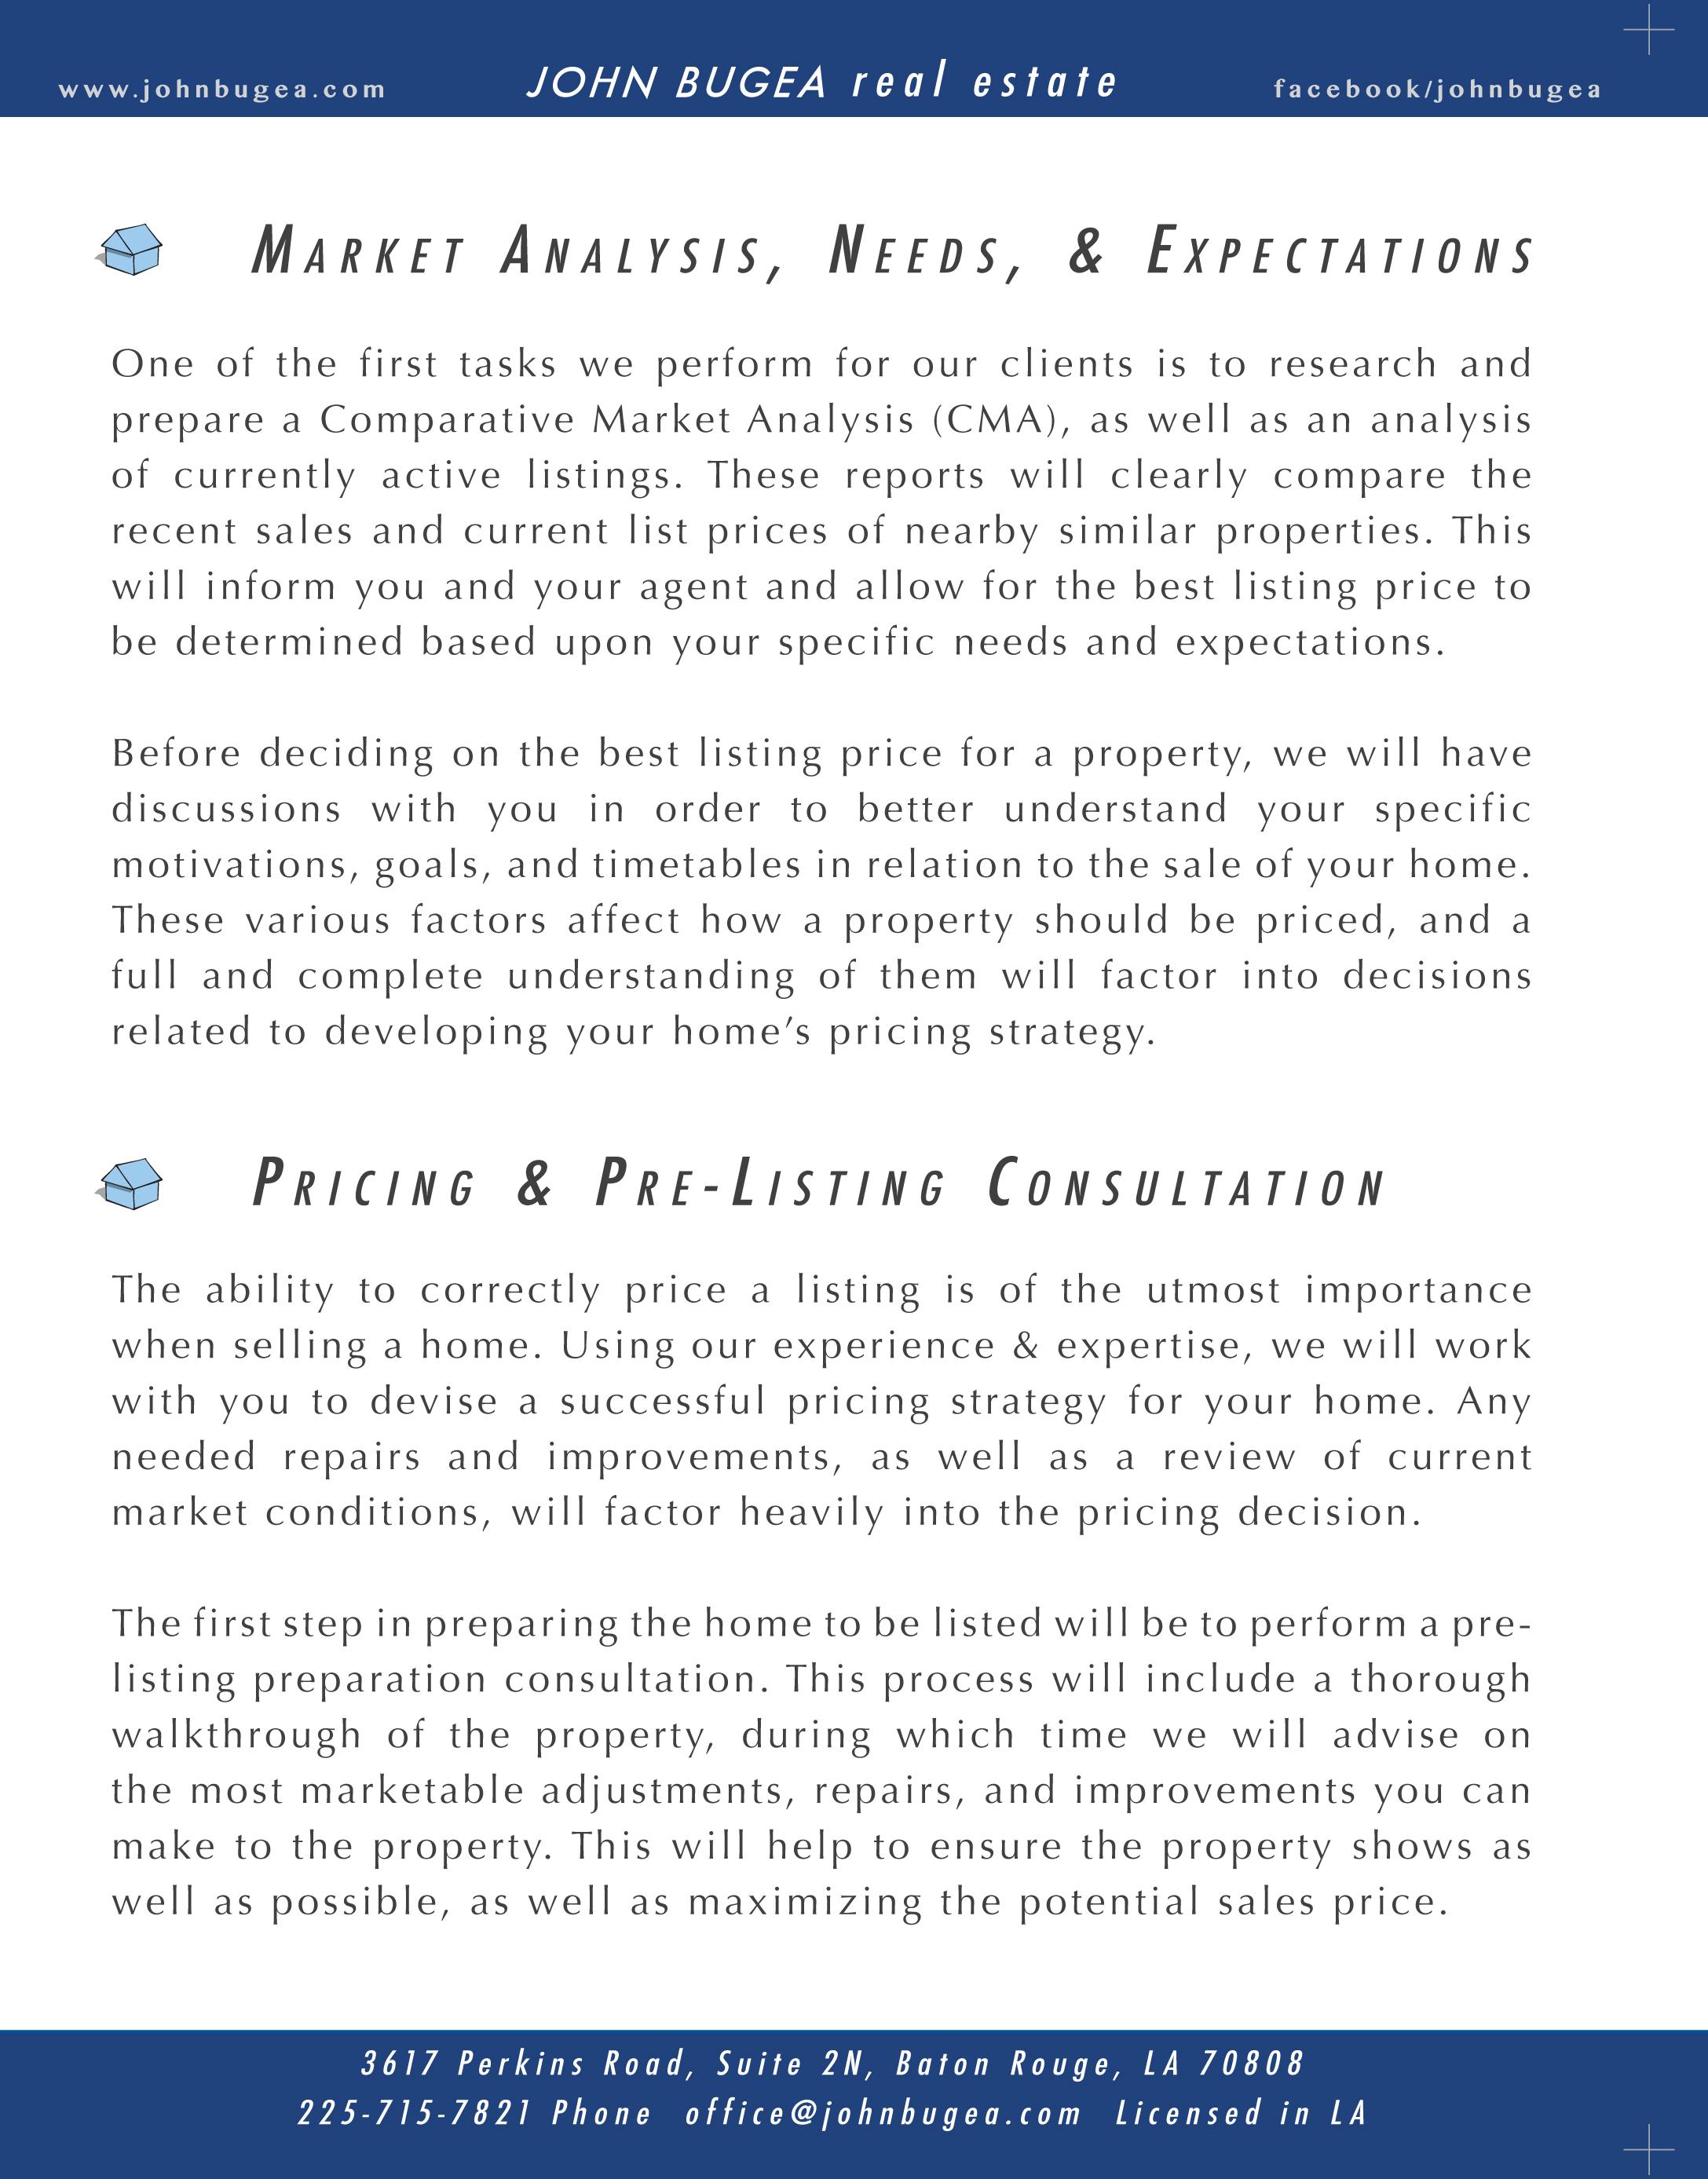 Listing Brochure copy 3.jpg